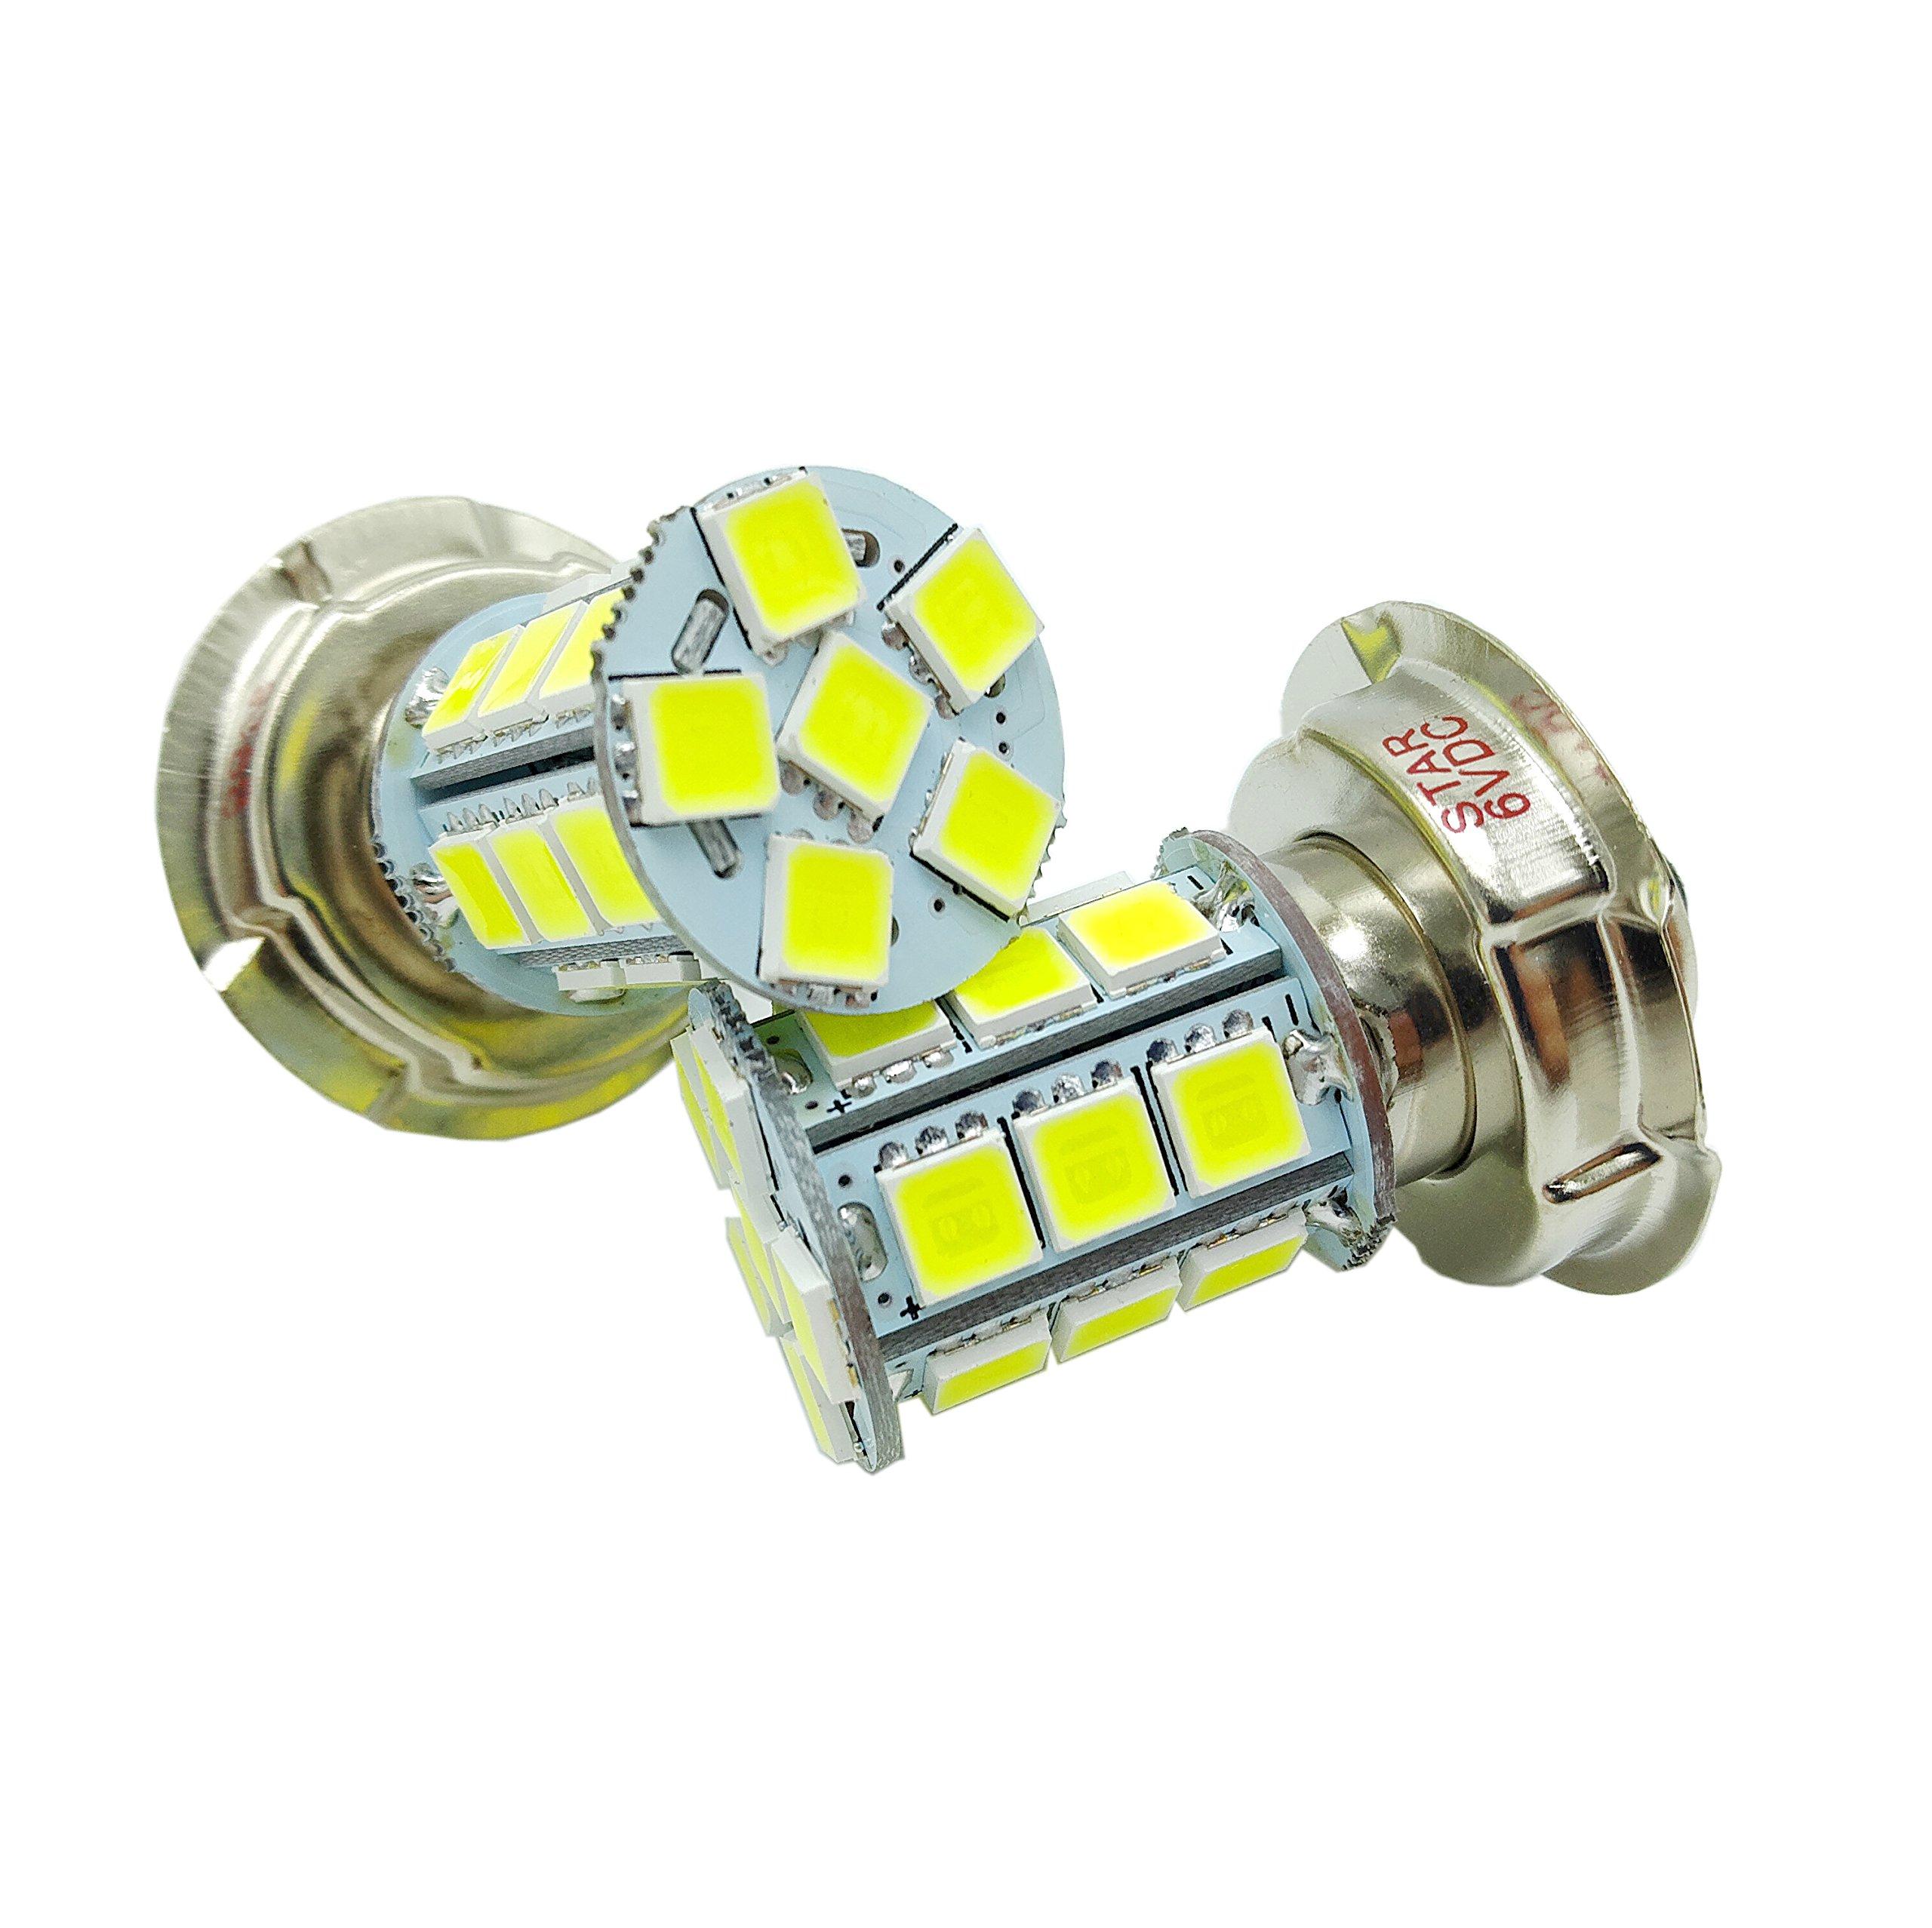 6V 56 SMD H4 LED Lamp Motorcycle Headlight Bulb Motorbike 10W 800LM 6000K White High//Low Conversion Kit